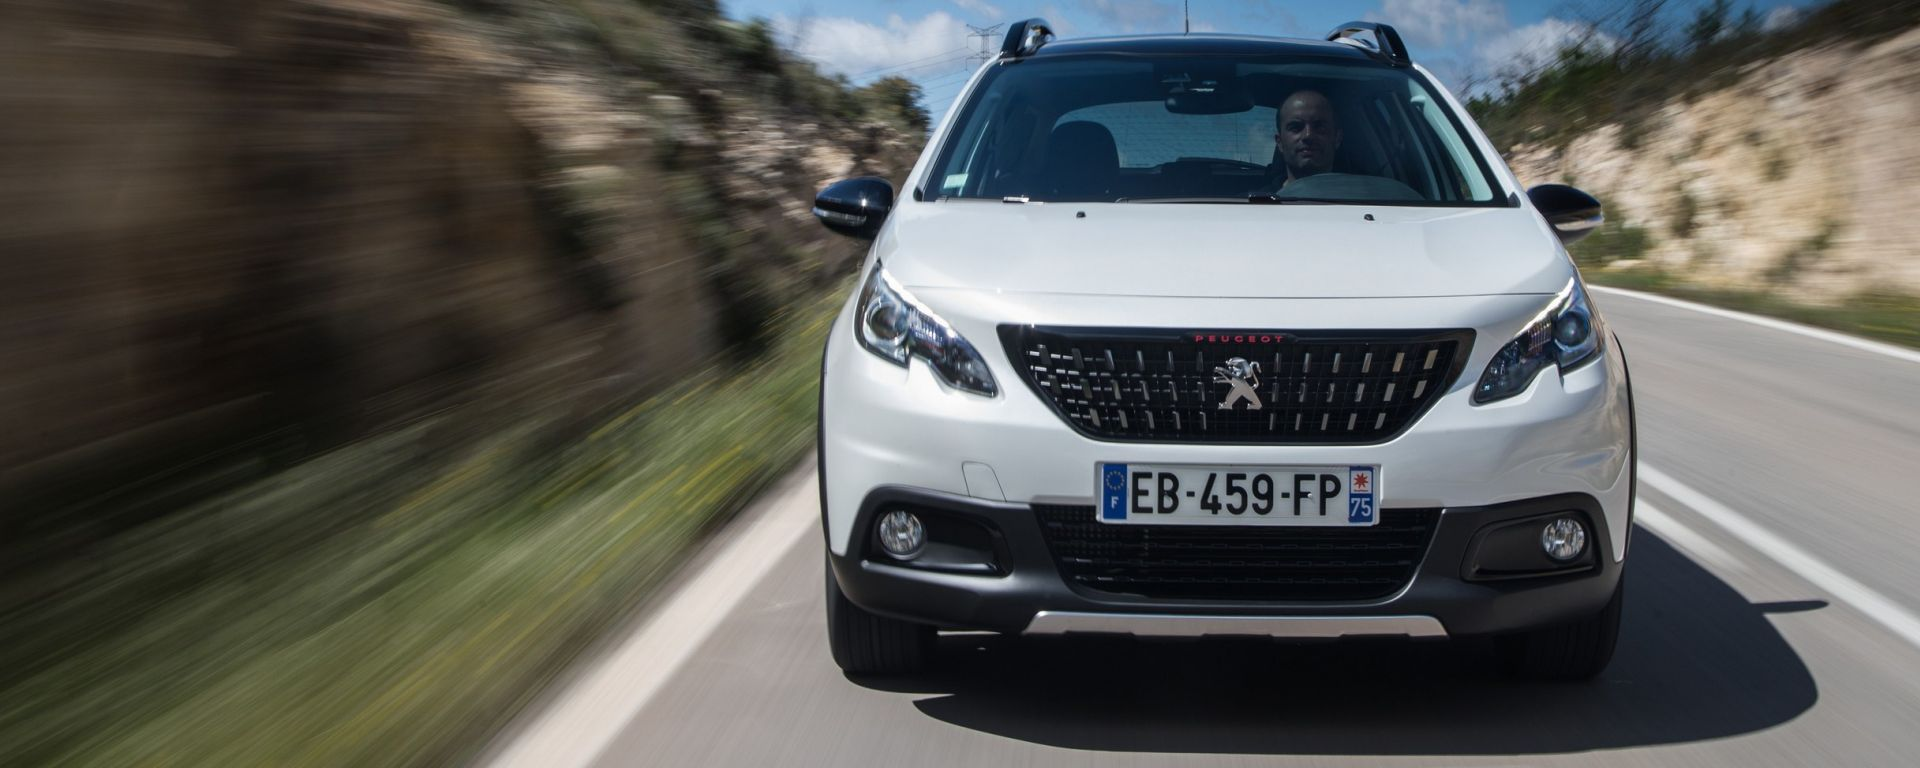 Nuova Peugeot 2008 frontale